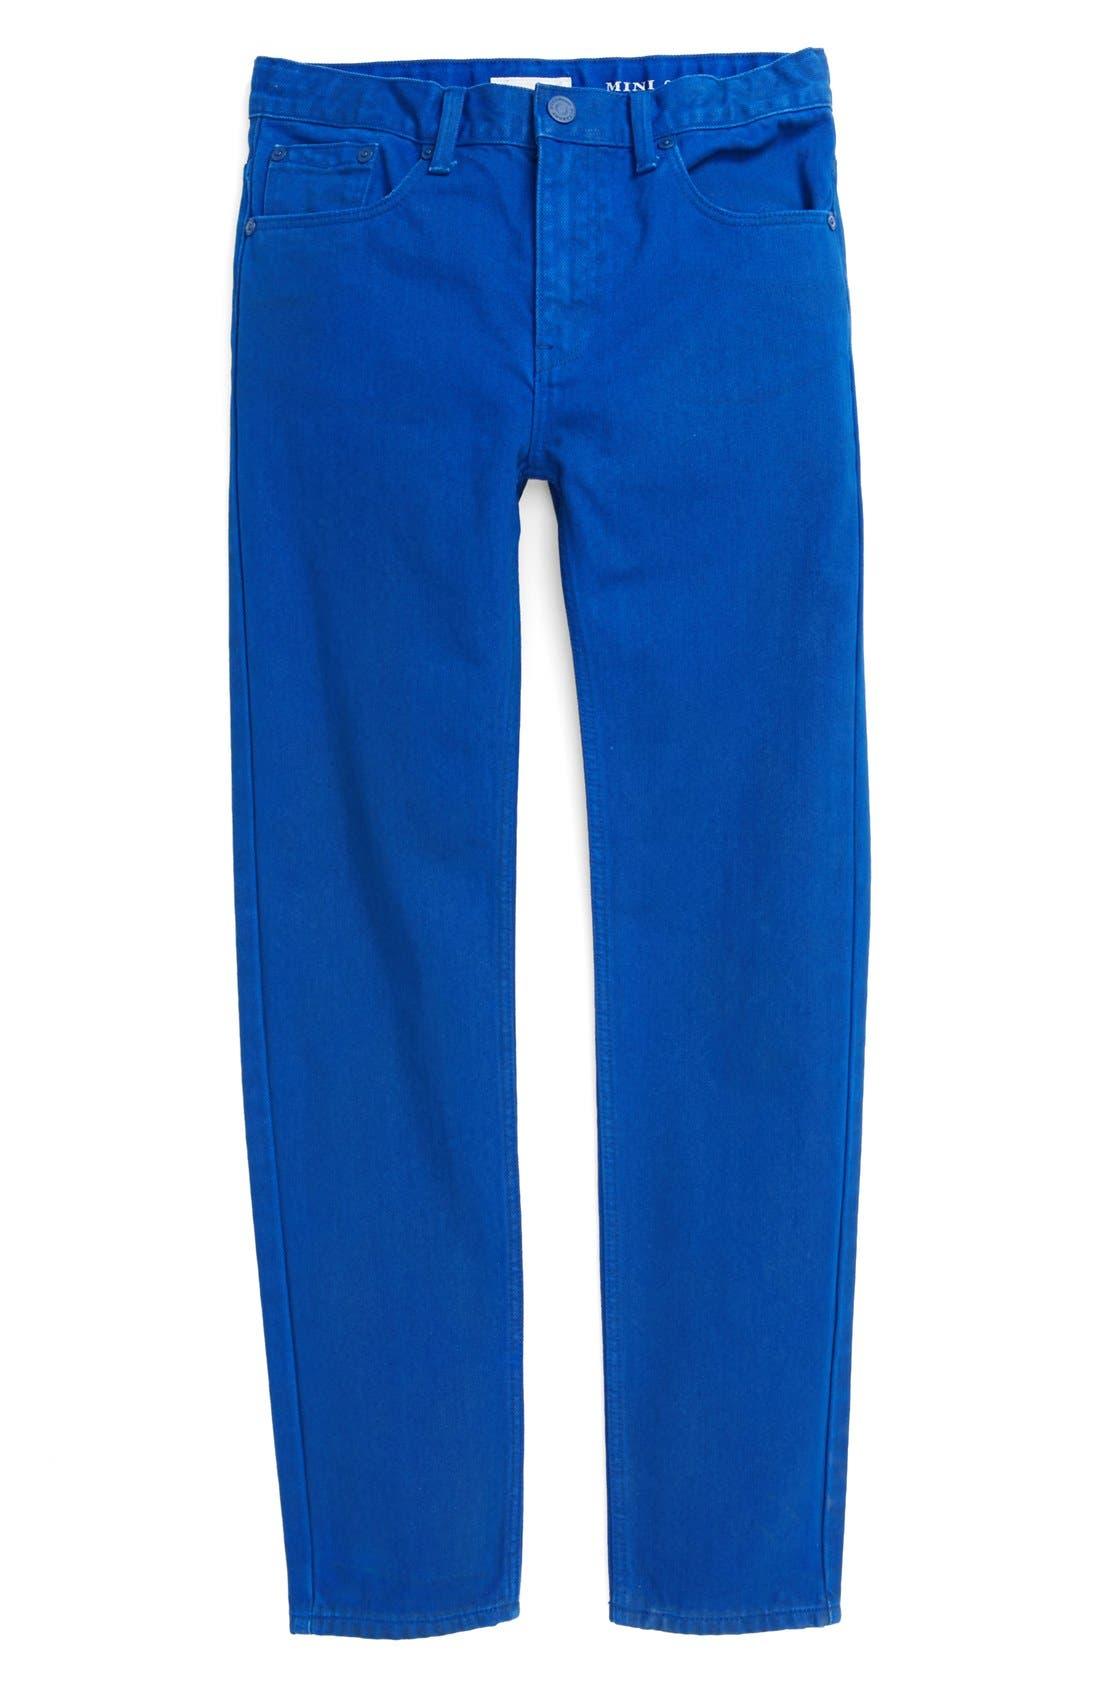 Alternate Image 2  - Burberry 'Mini Shoreditch' Skinny Jeans (Little Boys & Big Boys)